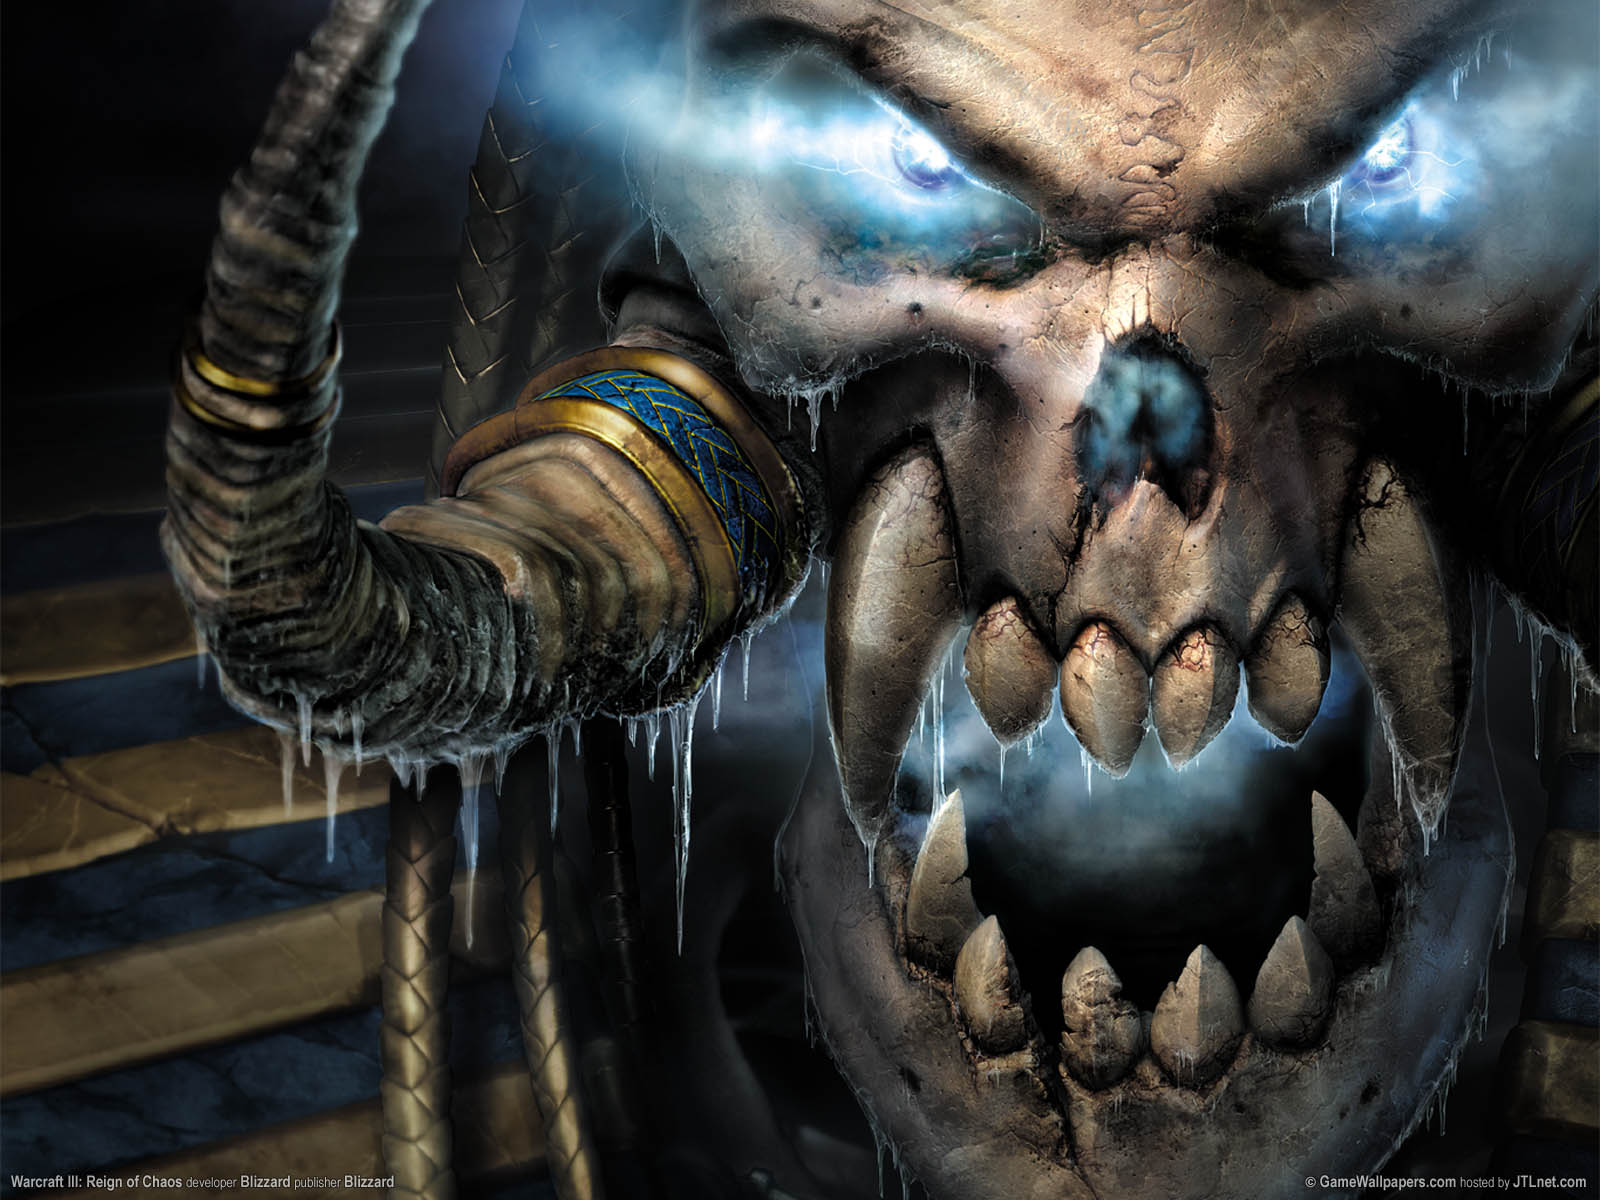 Warcraft 3: Reign of Chaos fondo de escritorio 12 1600x1200